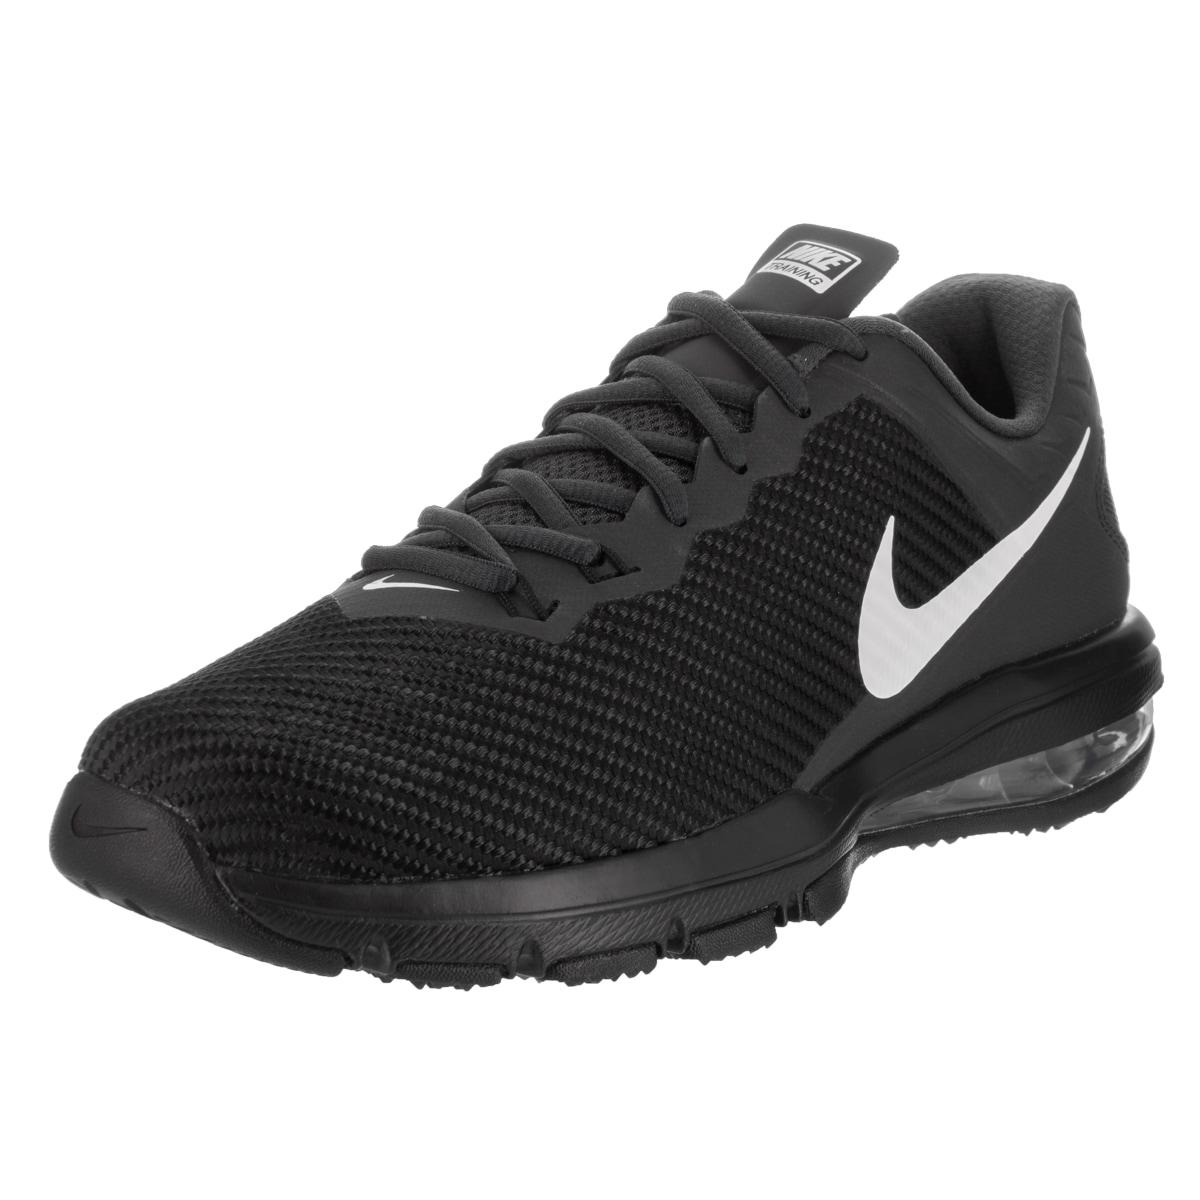 b86c4ea4c5eb6 Nike Men's Air Max Full Ride Tr 1.5 Training Shoe